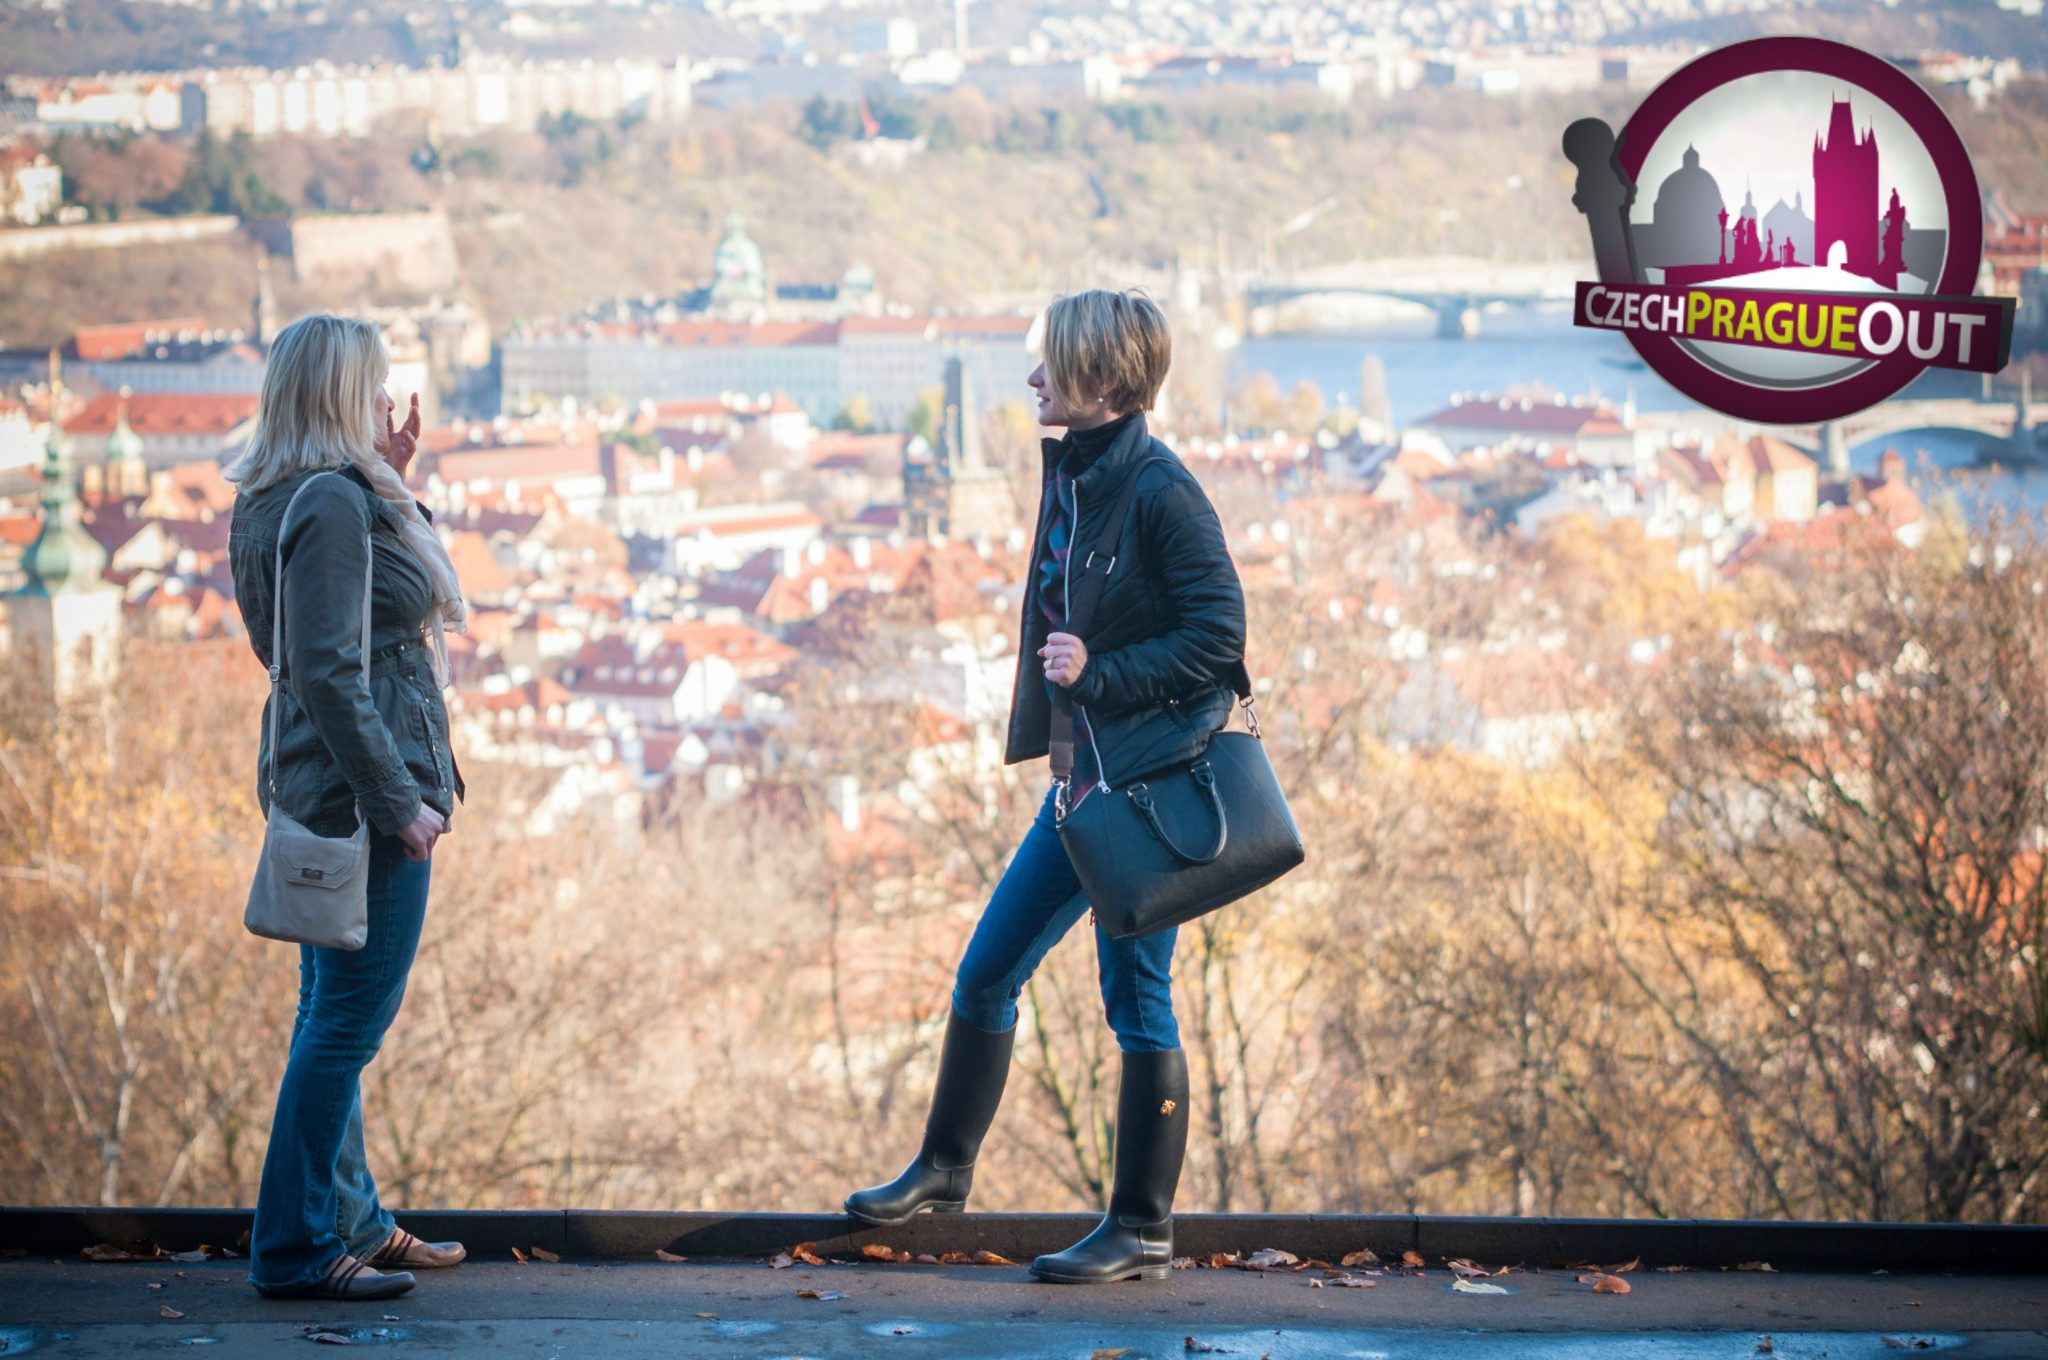 Bety & Tereza, CzechPragueOut